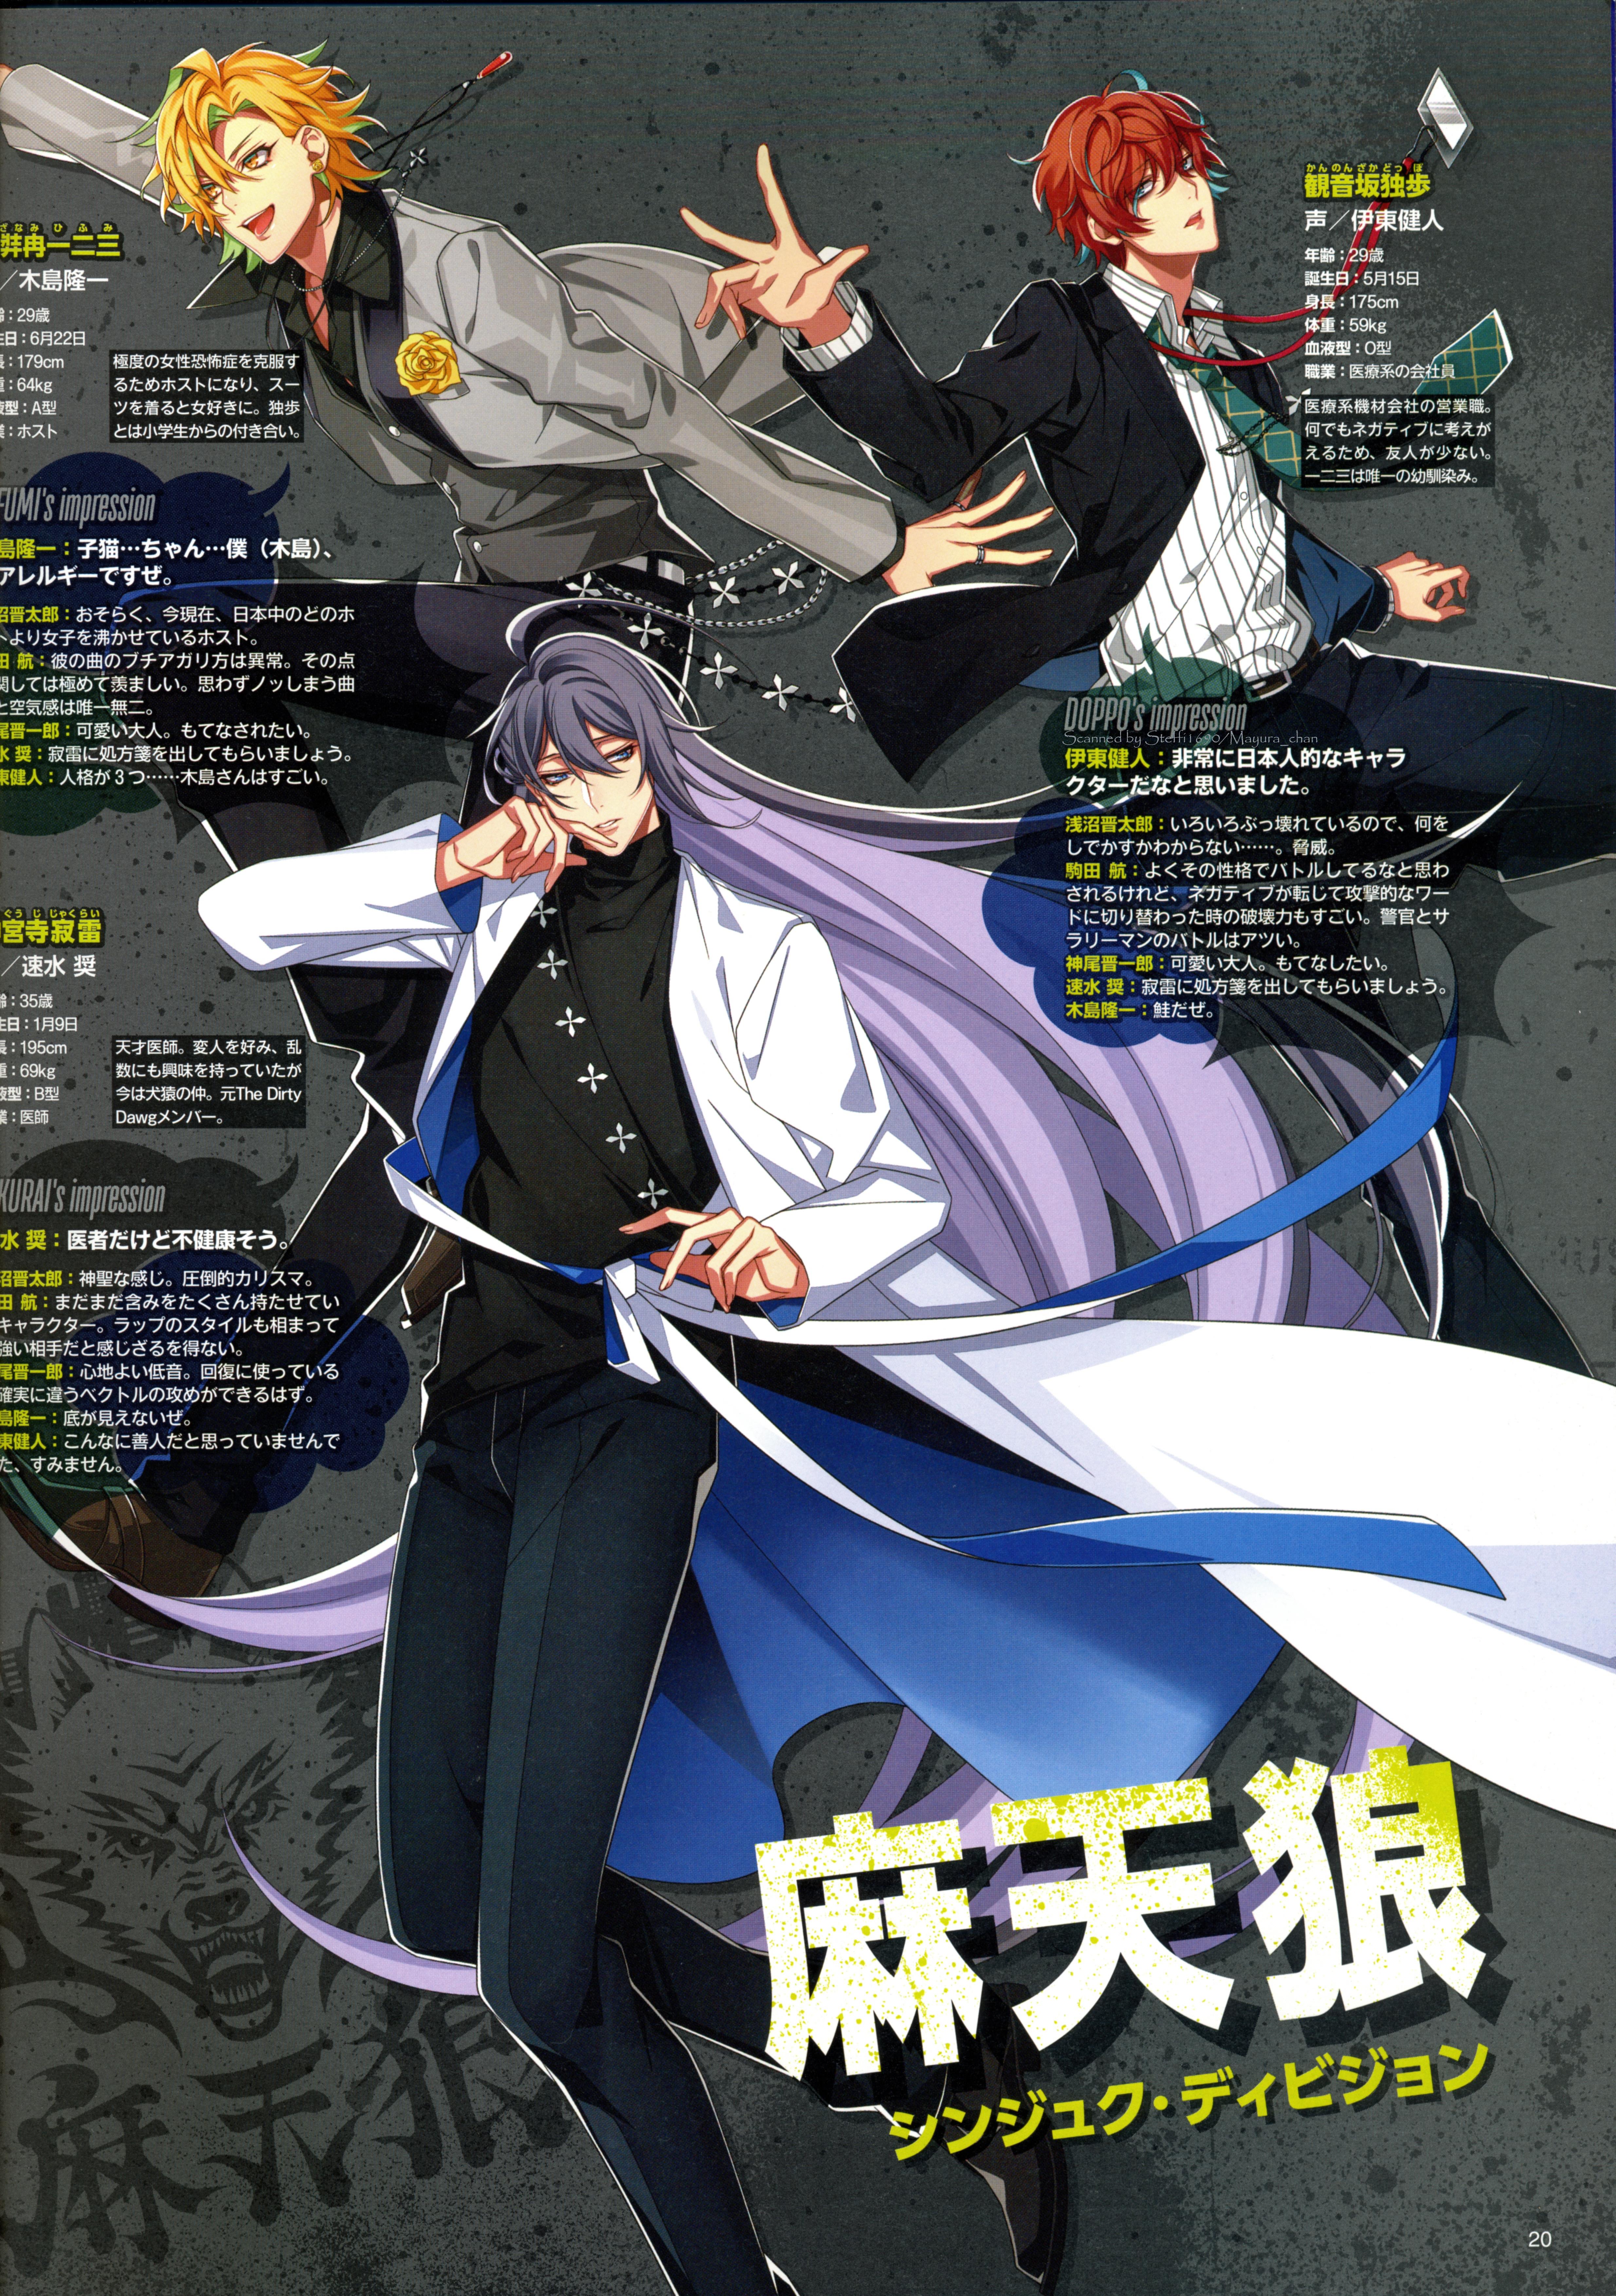 Matenrou - Hypnosis Mic -Division Rap Battle- - Mobile